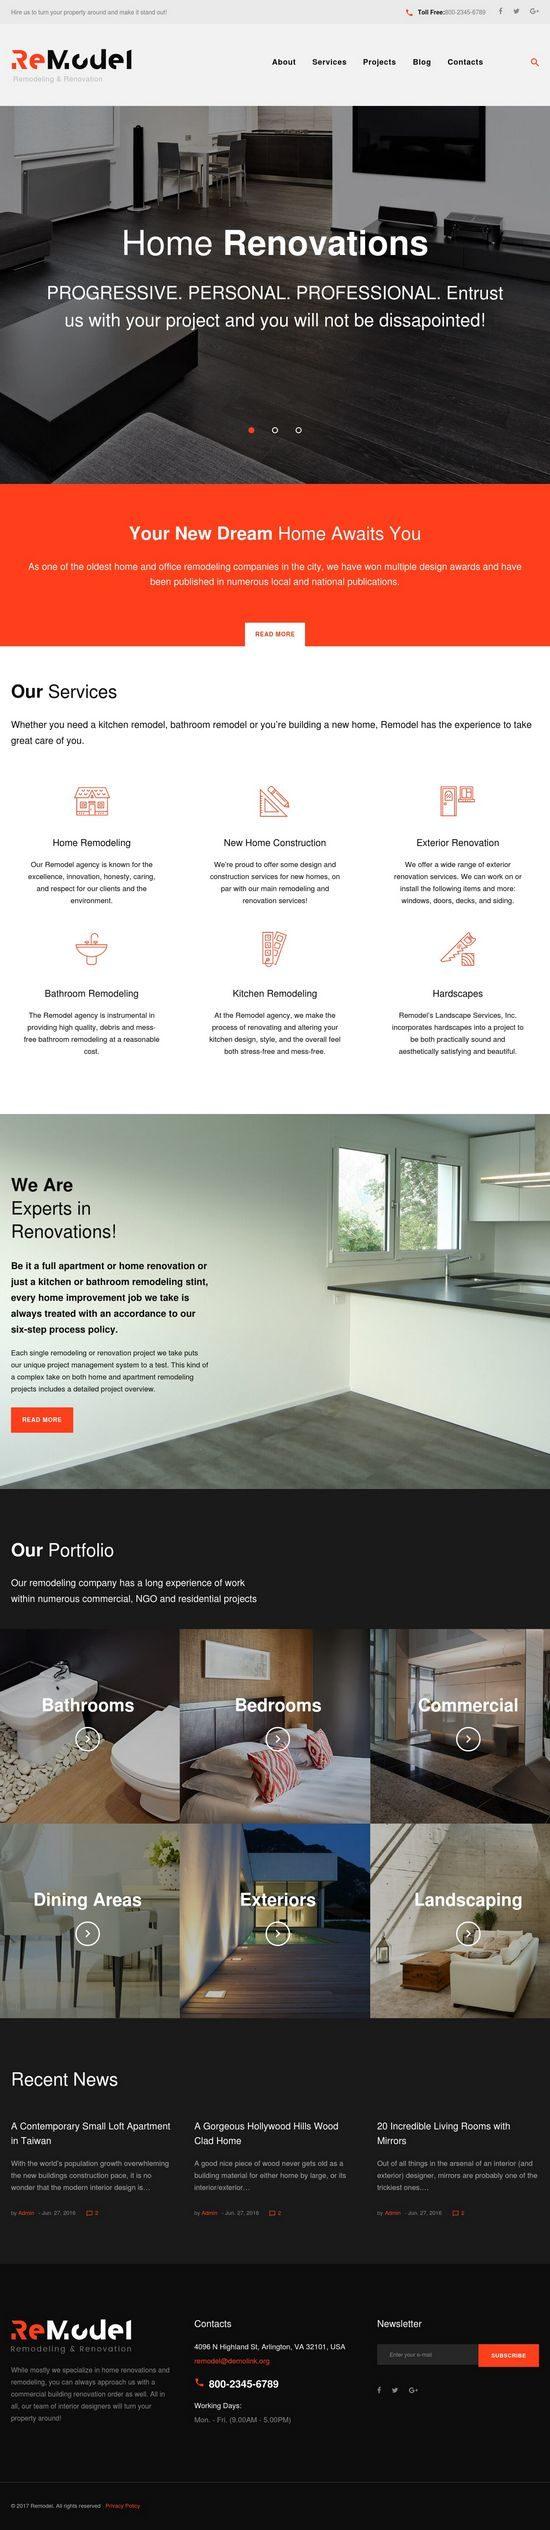 remodel interior design wordpress theme 01 550x2530 - Remodel WordPress Theme